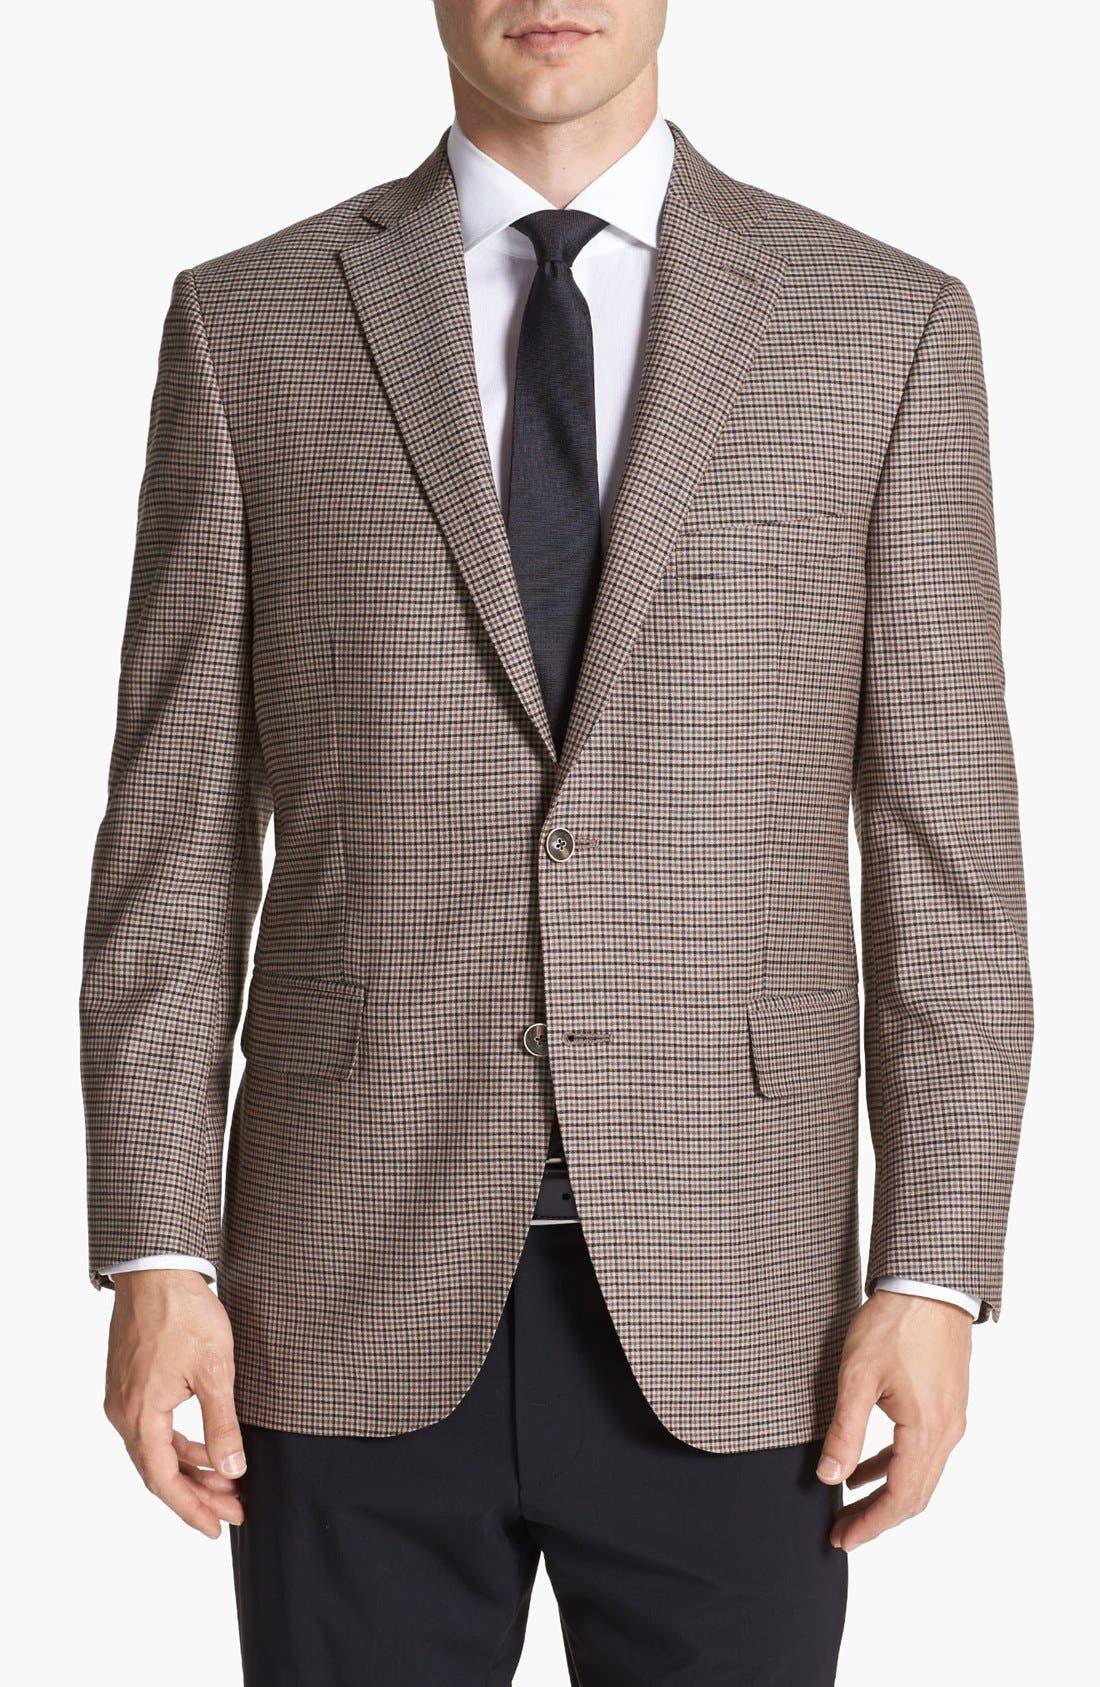 Main Image - Peter Millar Check Wool Sportcoat